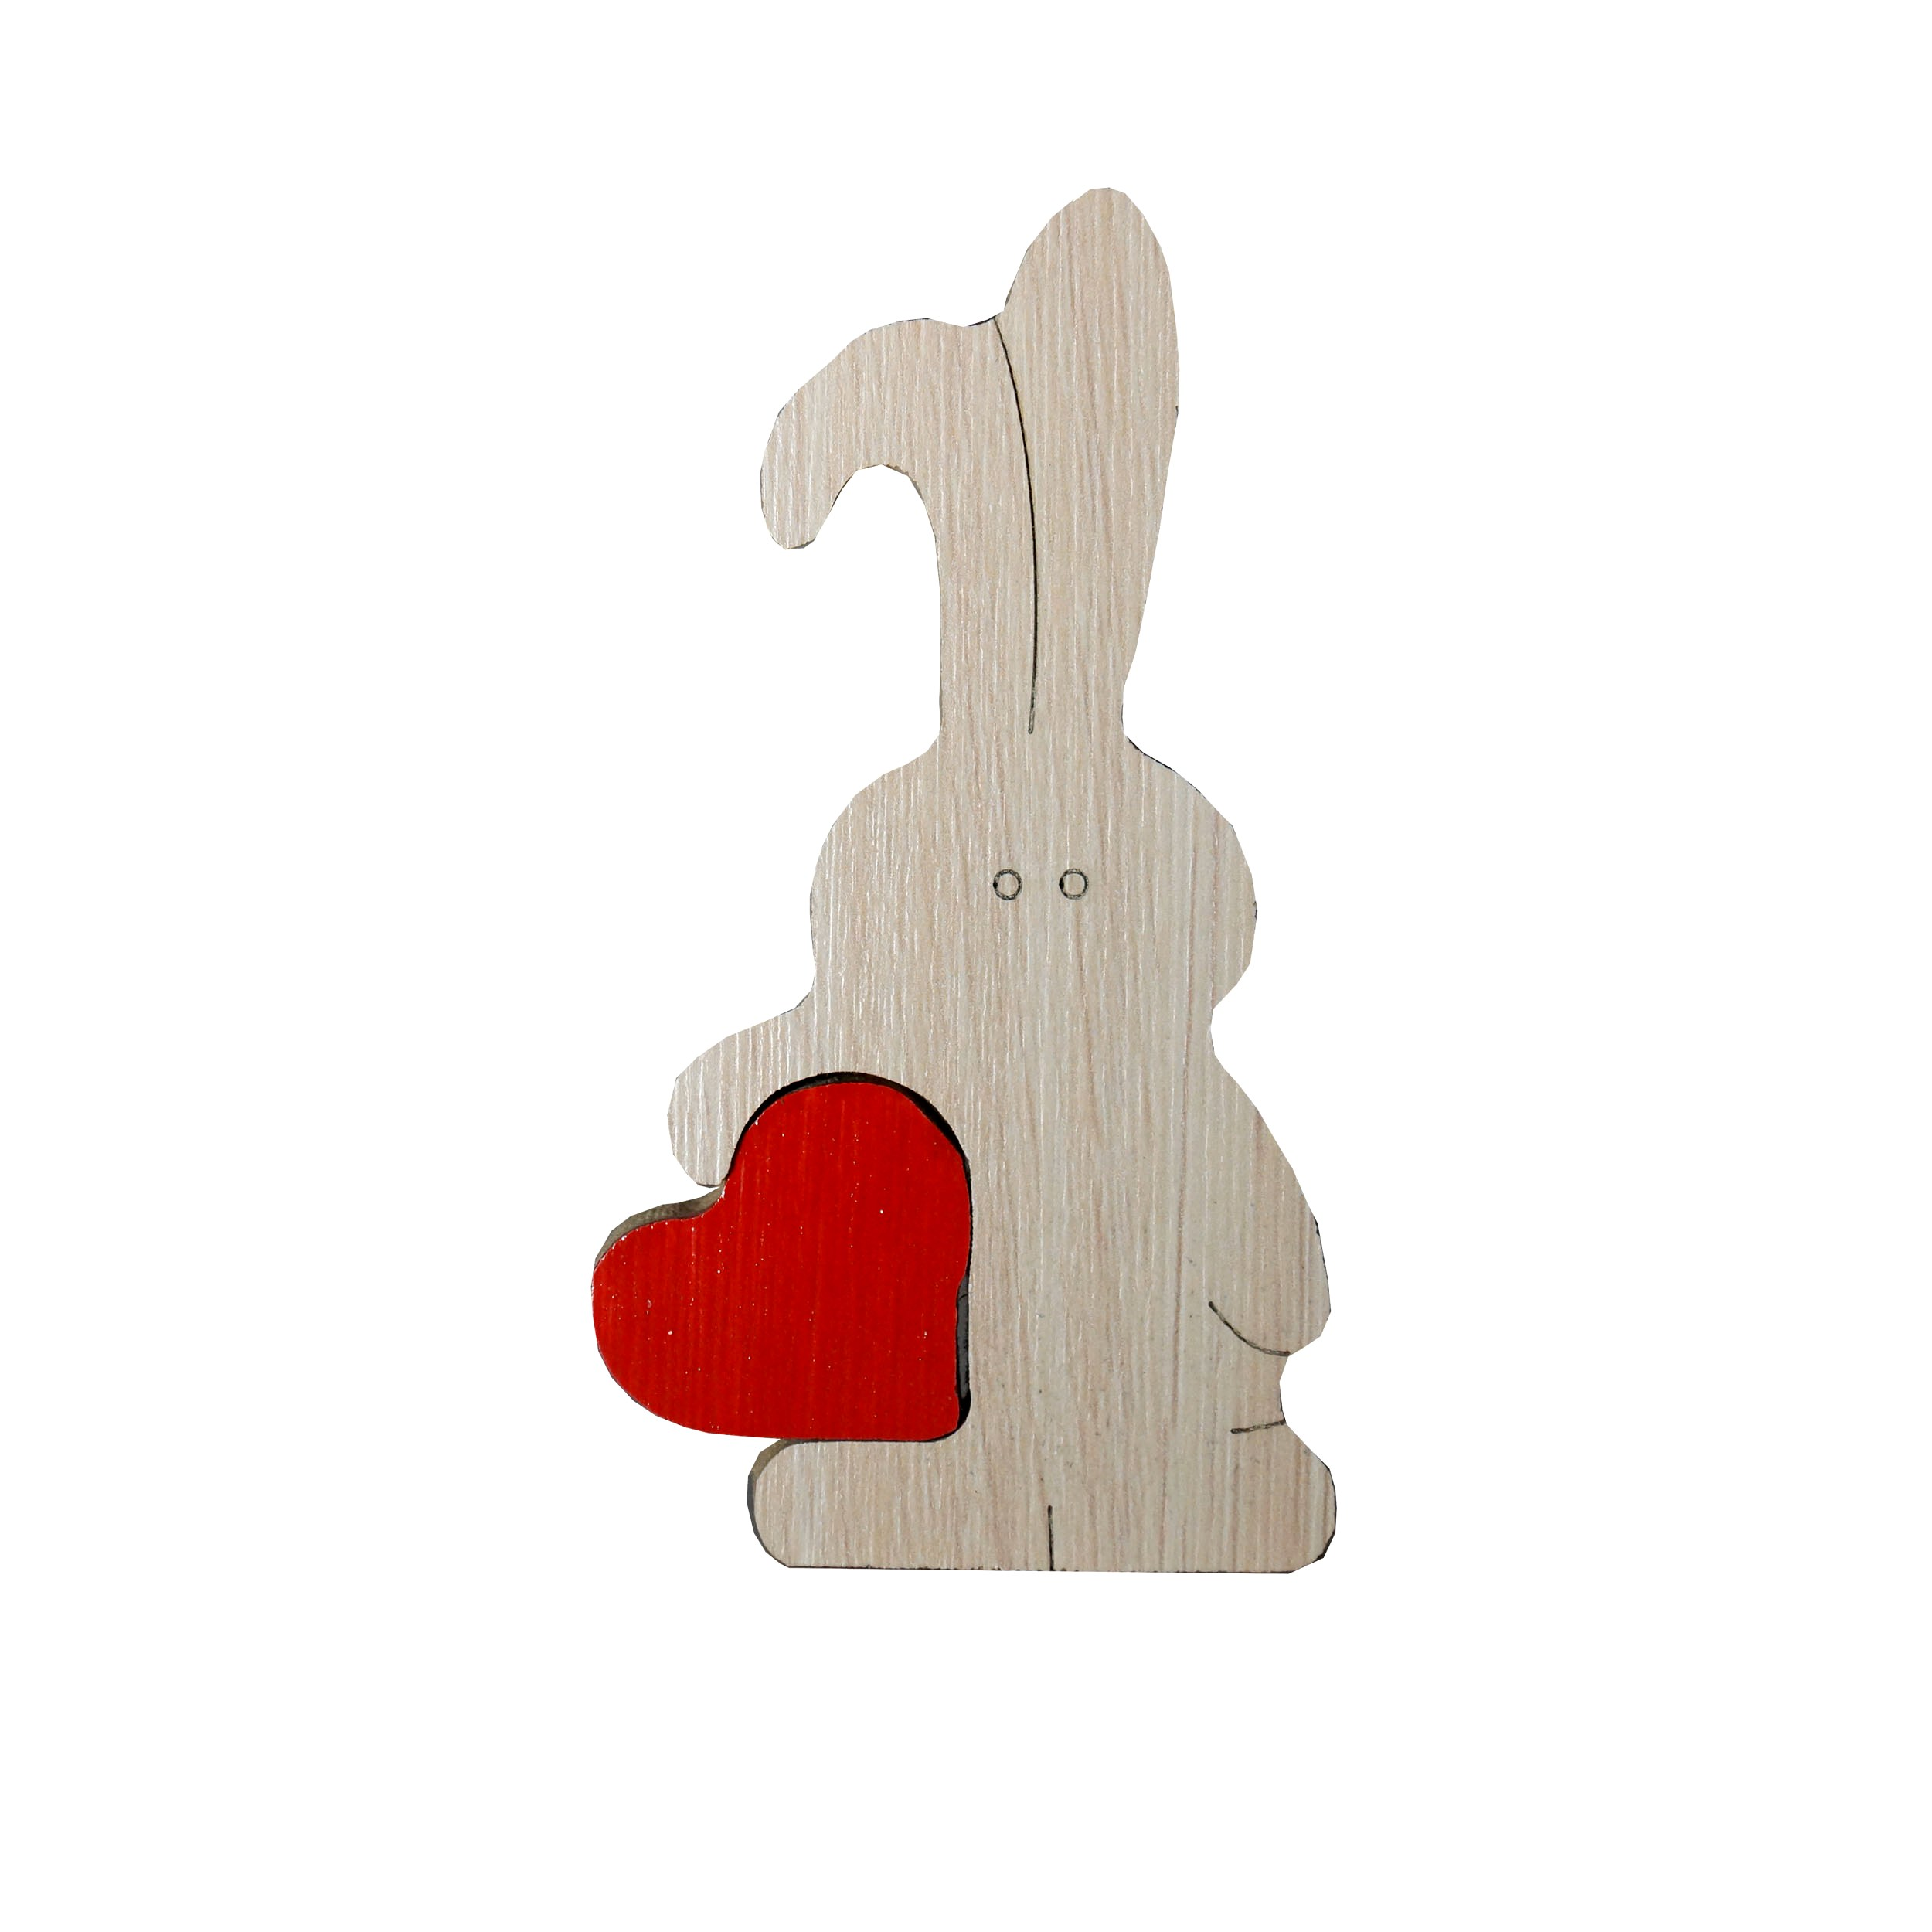 عکس مجسمه چوبی خرگوش عاشق مدل 110